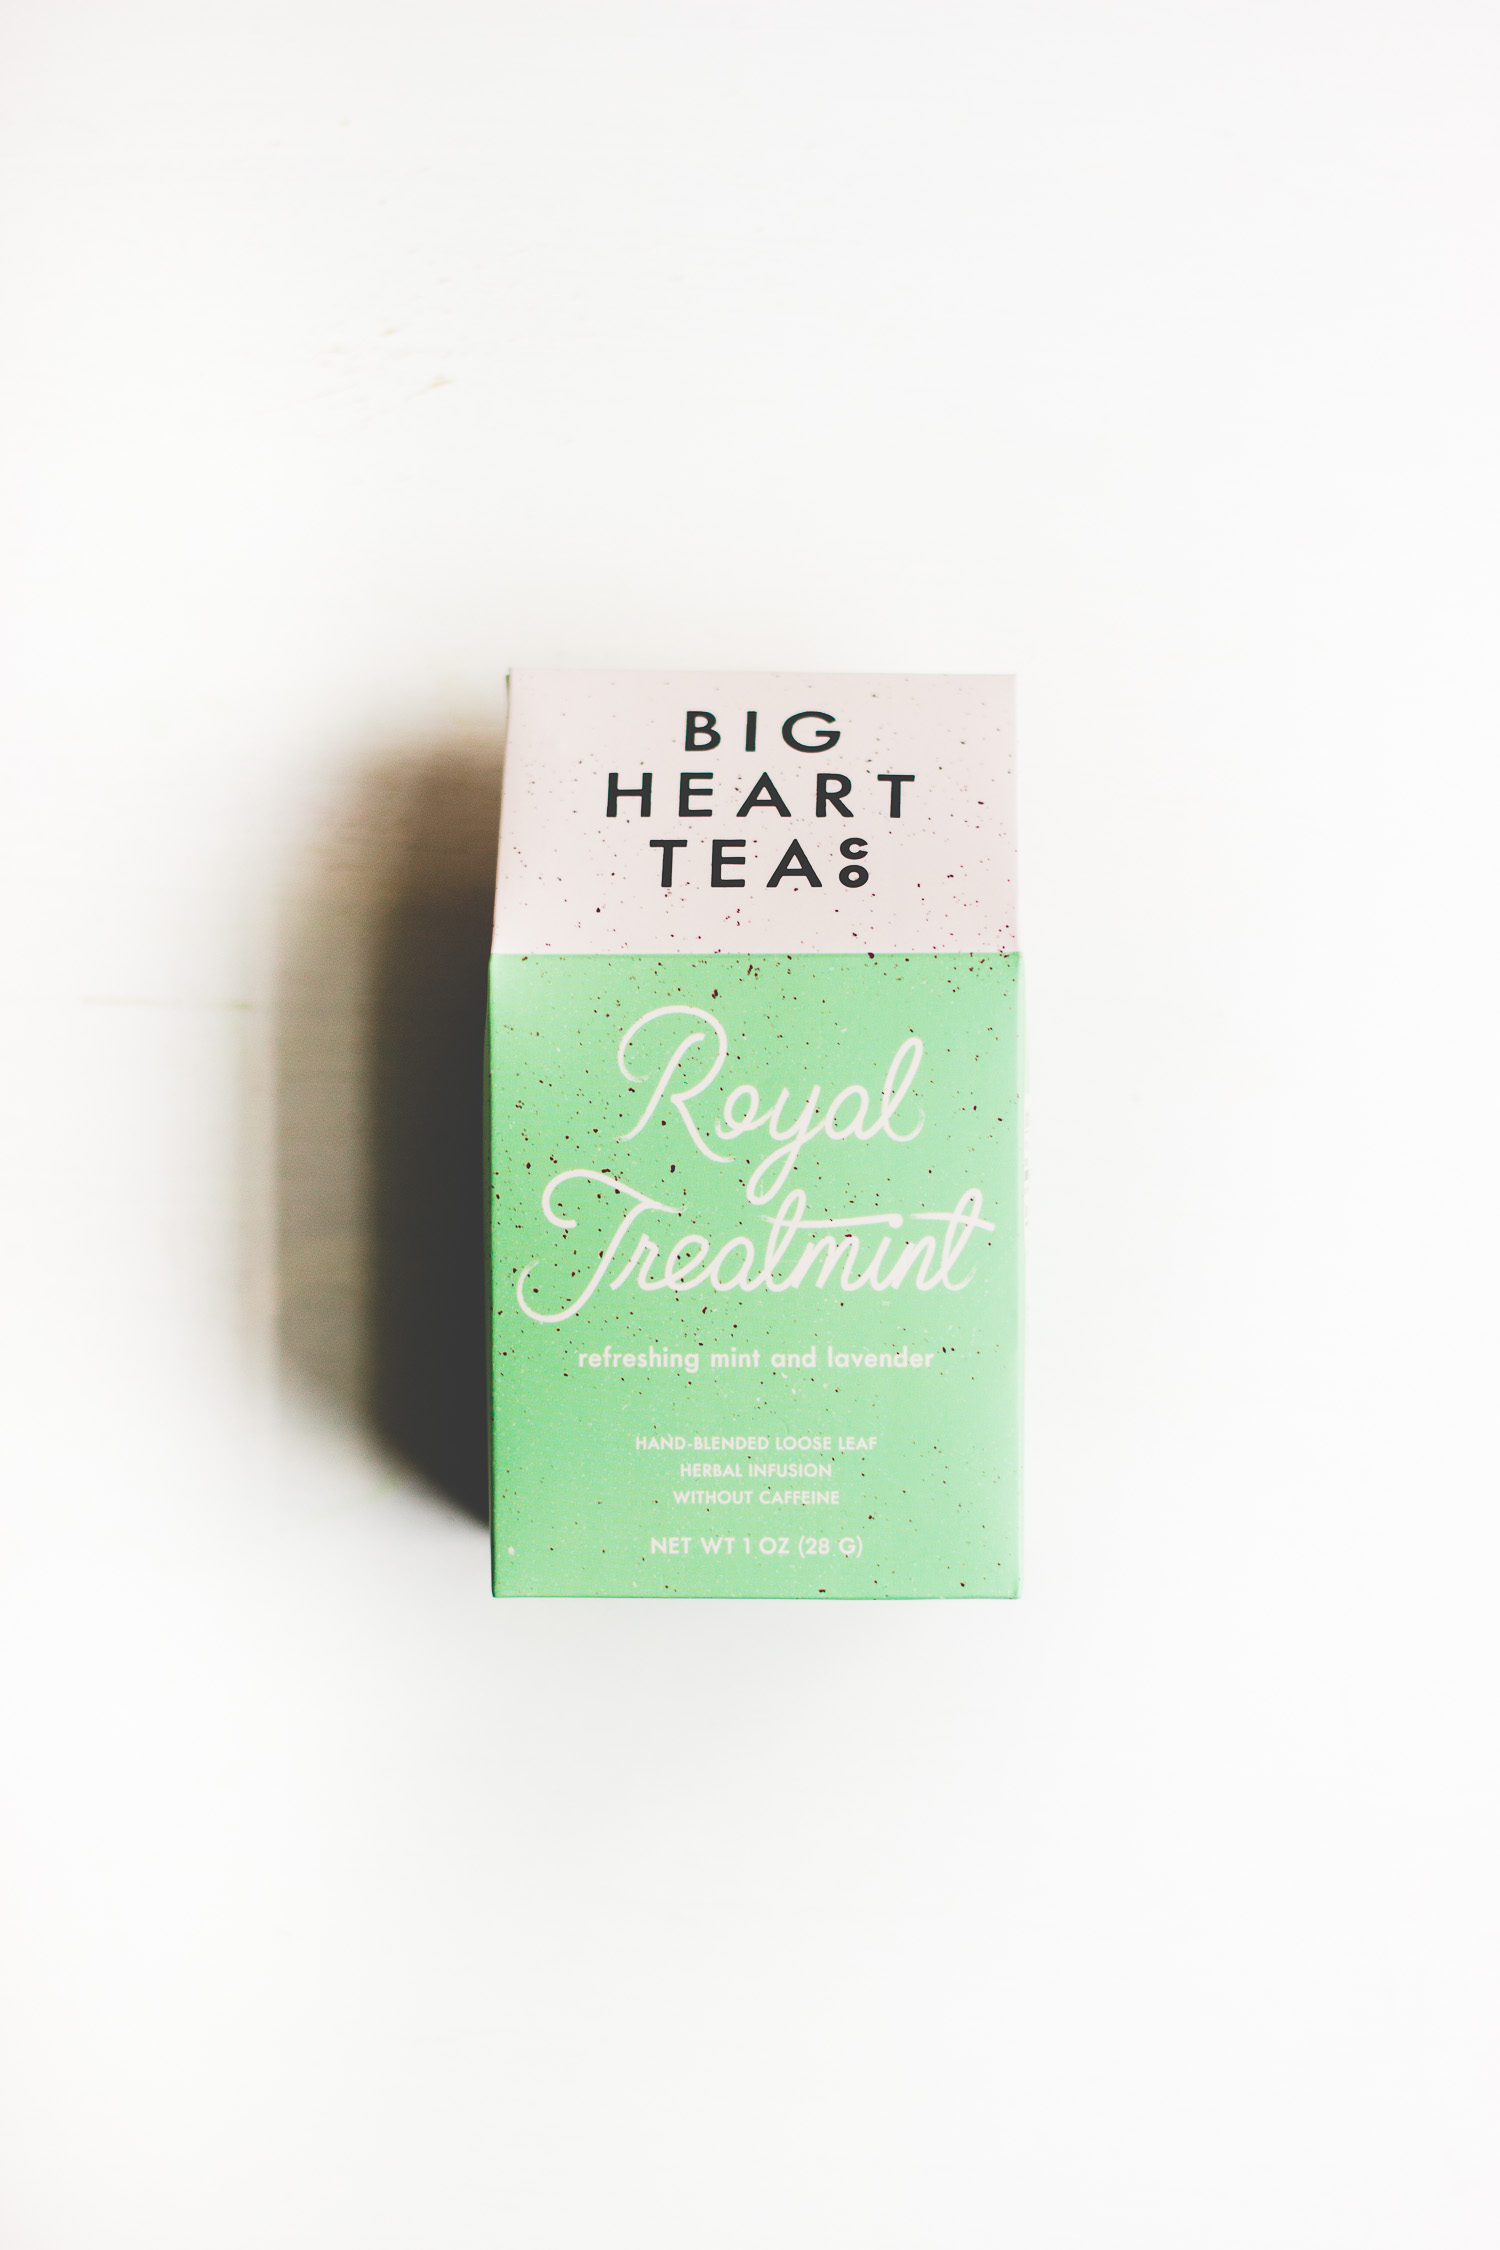 big-heart-tea-royal-treatmint-box.jpg